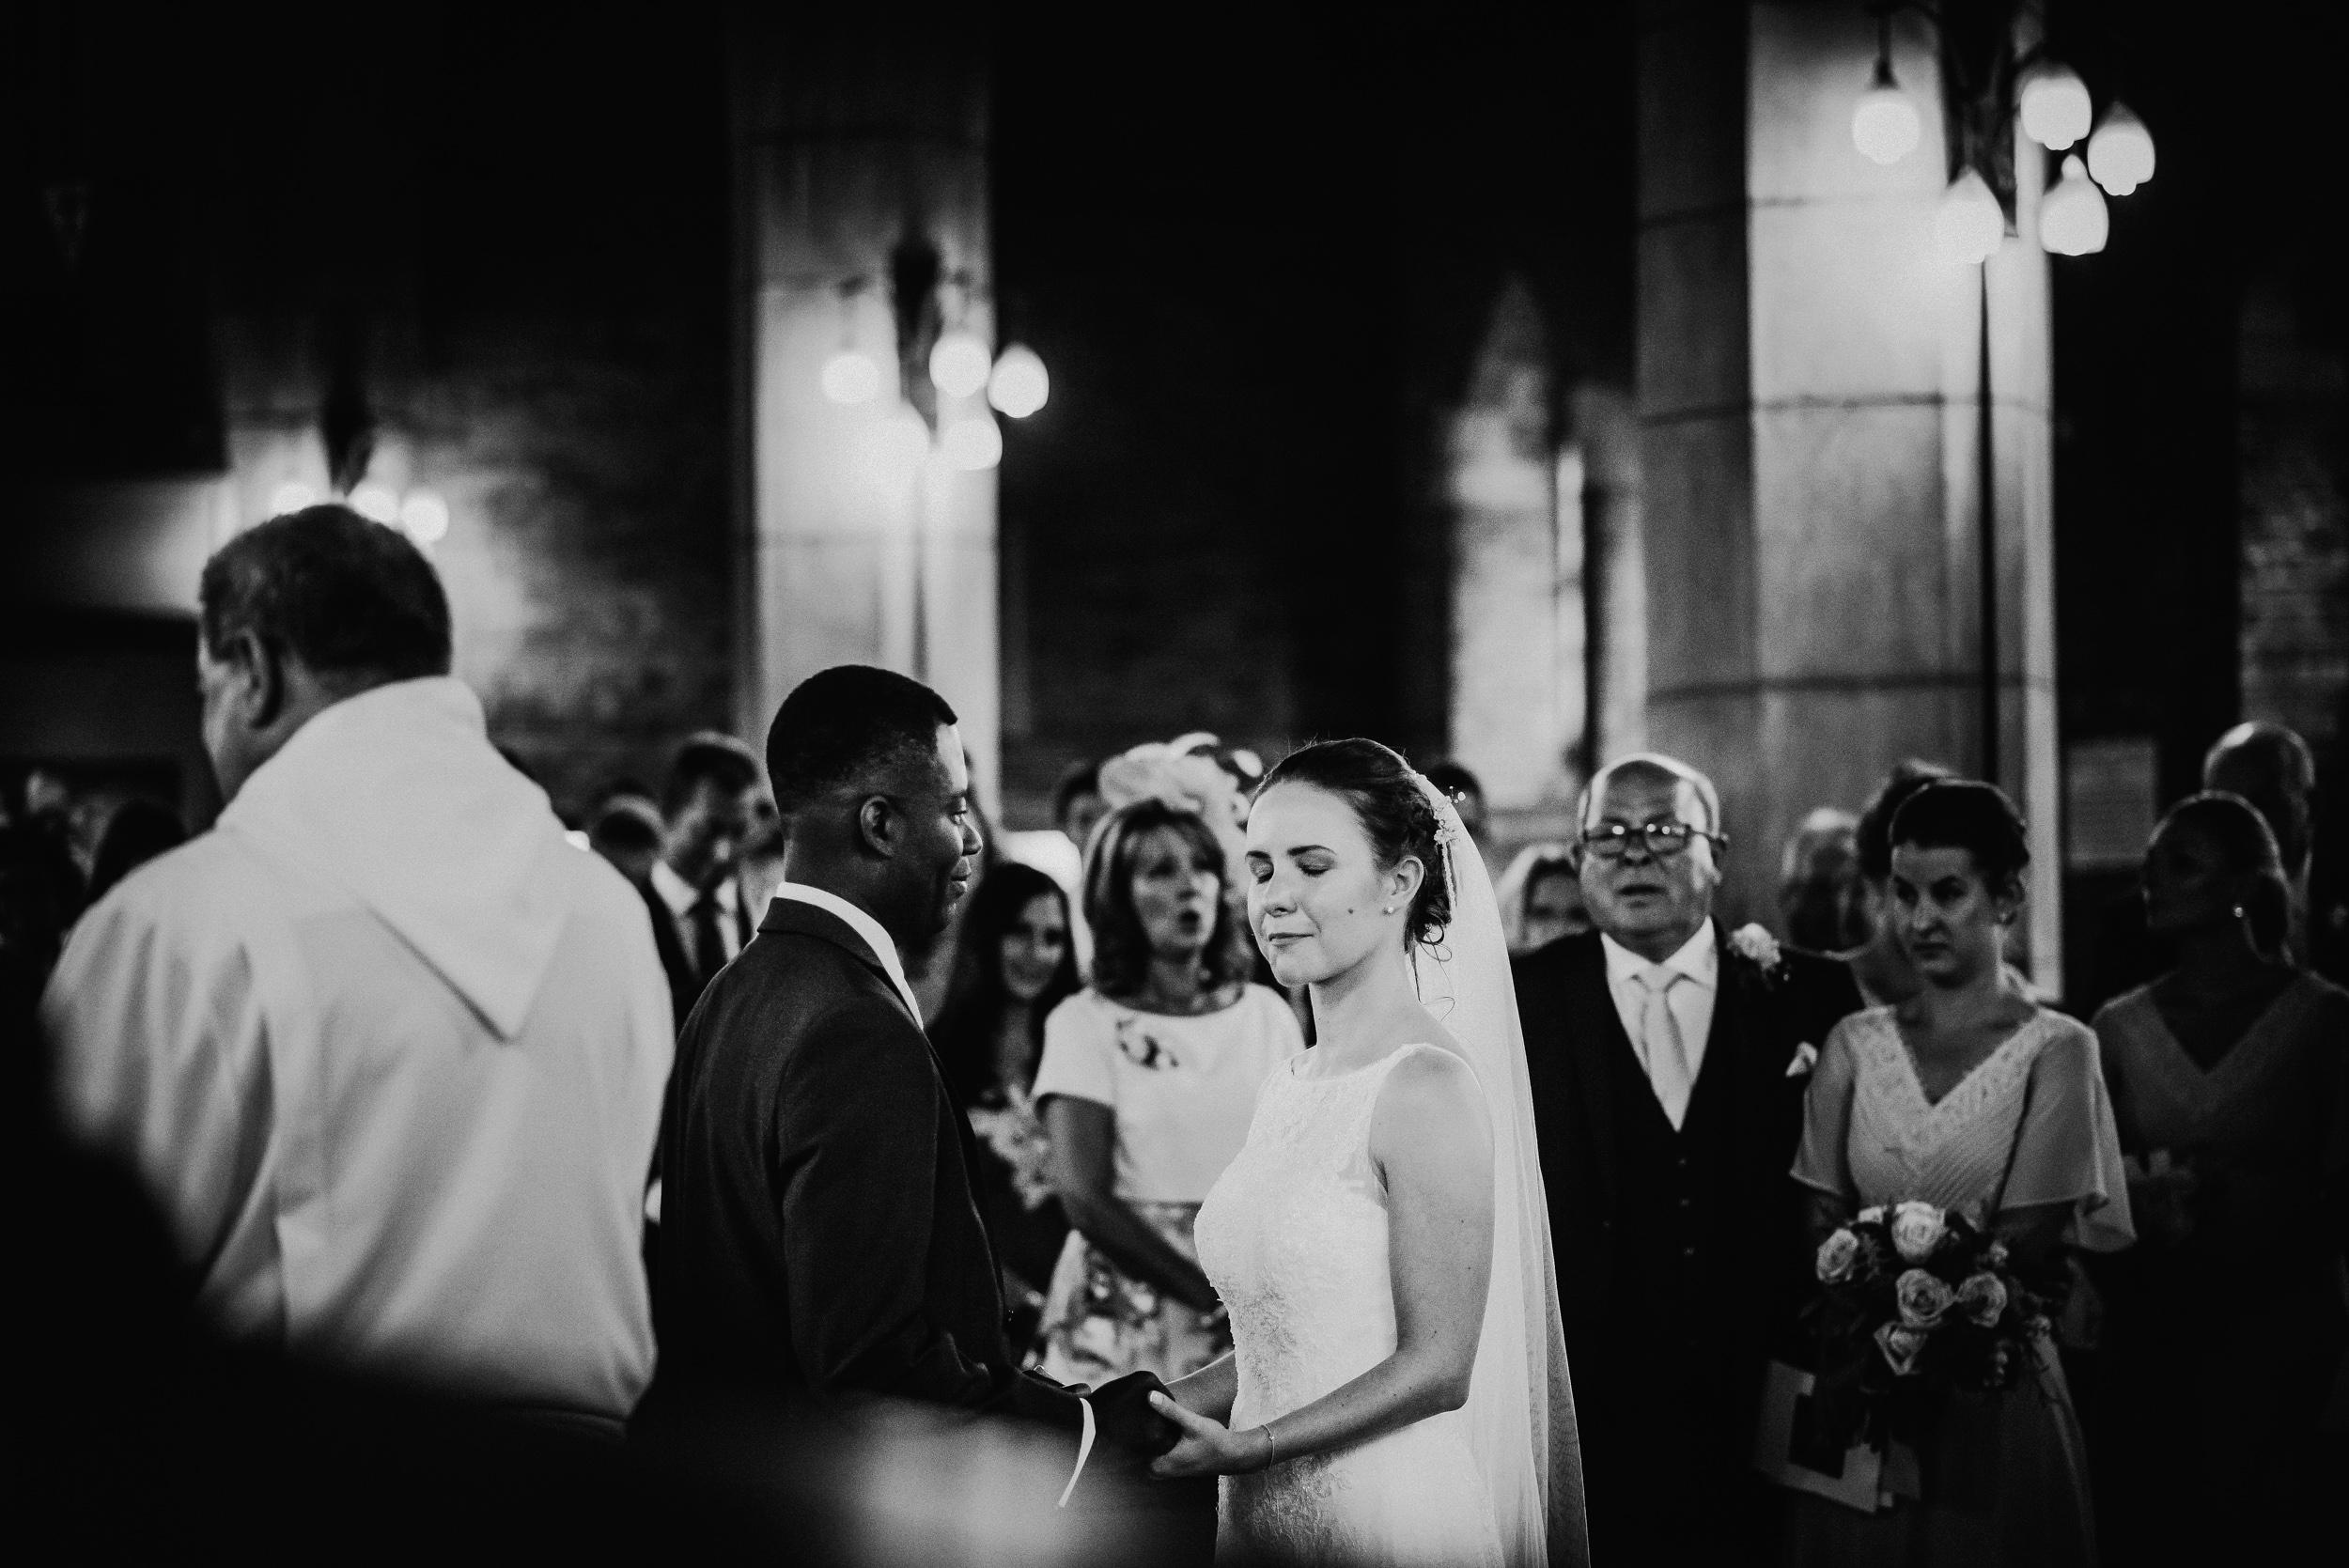 David Scholes Lancashire wedding photography 2016-54.jpg